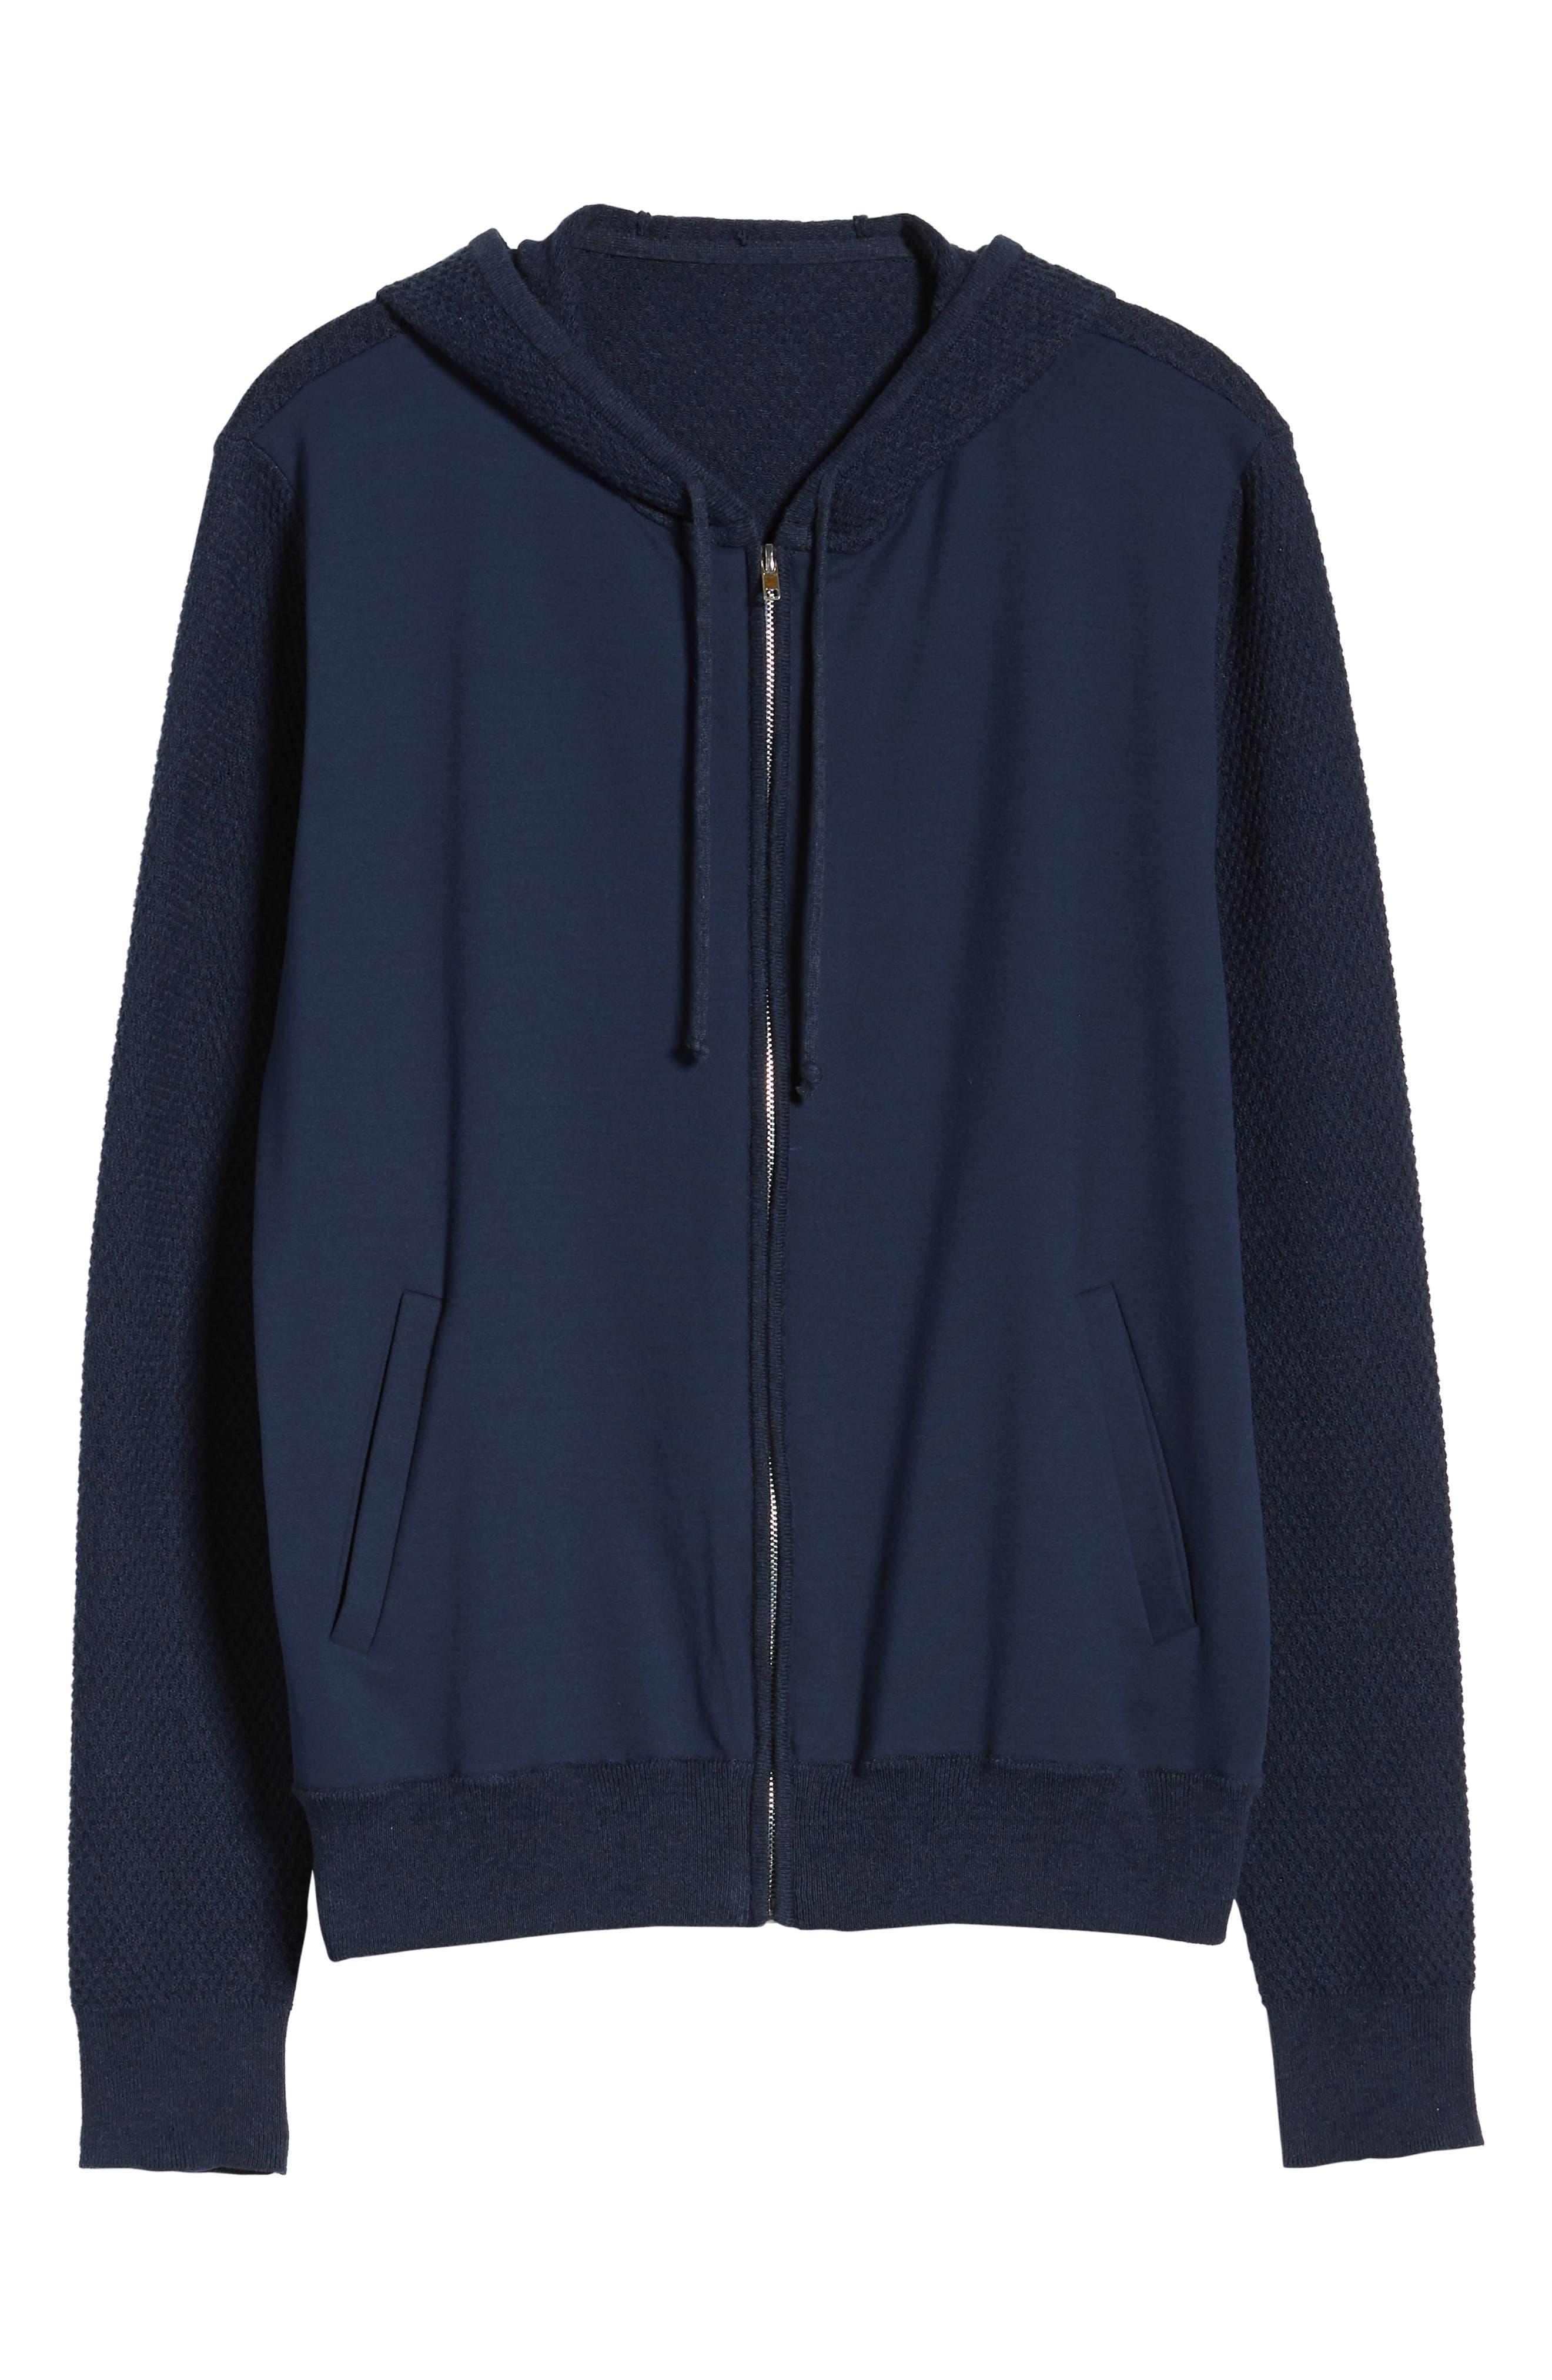 ZACHARY PRELL, Cedarhurst Hooded Zip Sweater, Alternate thumbnail 7, color, NAVY